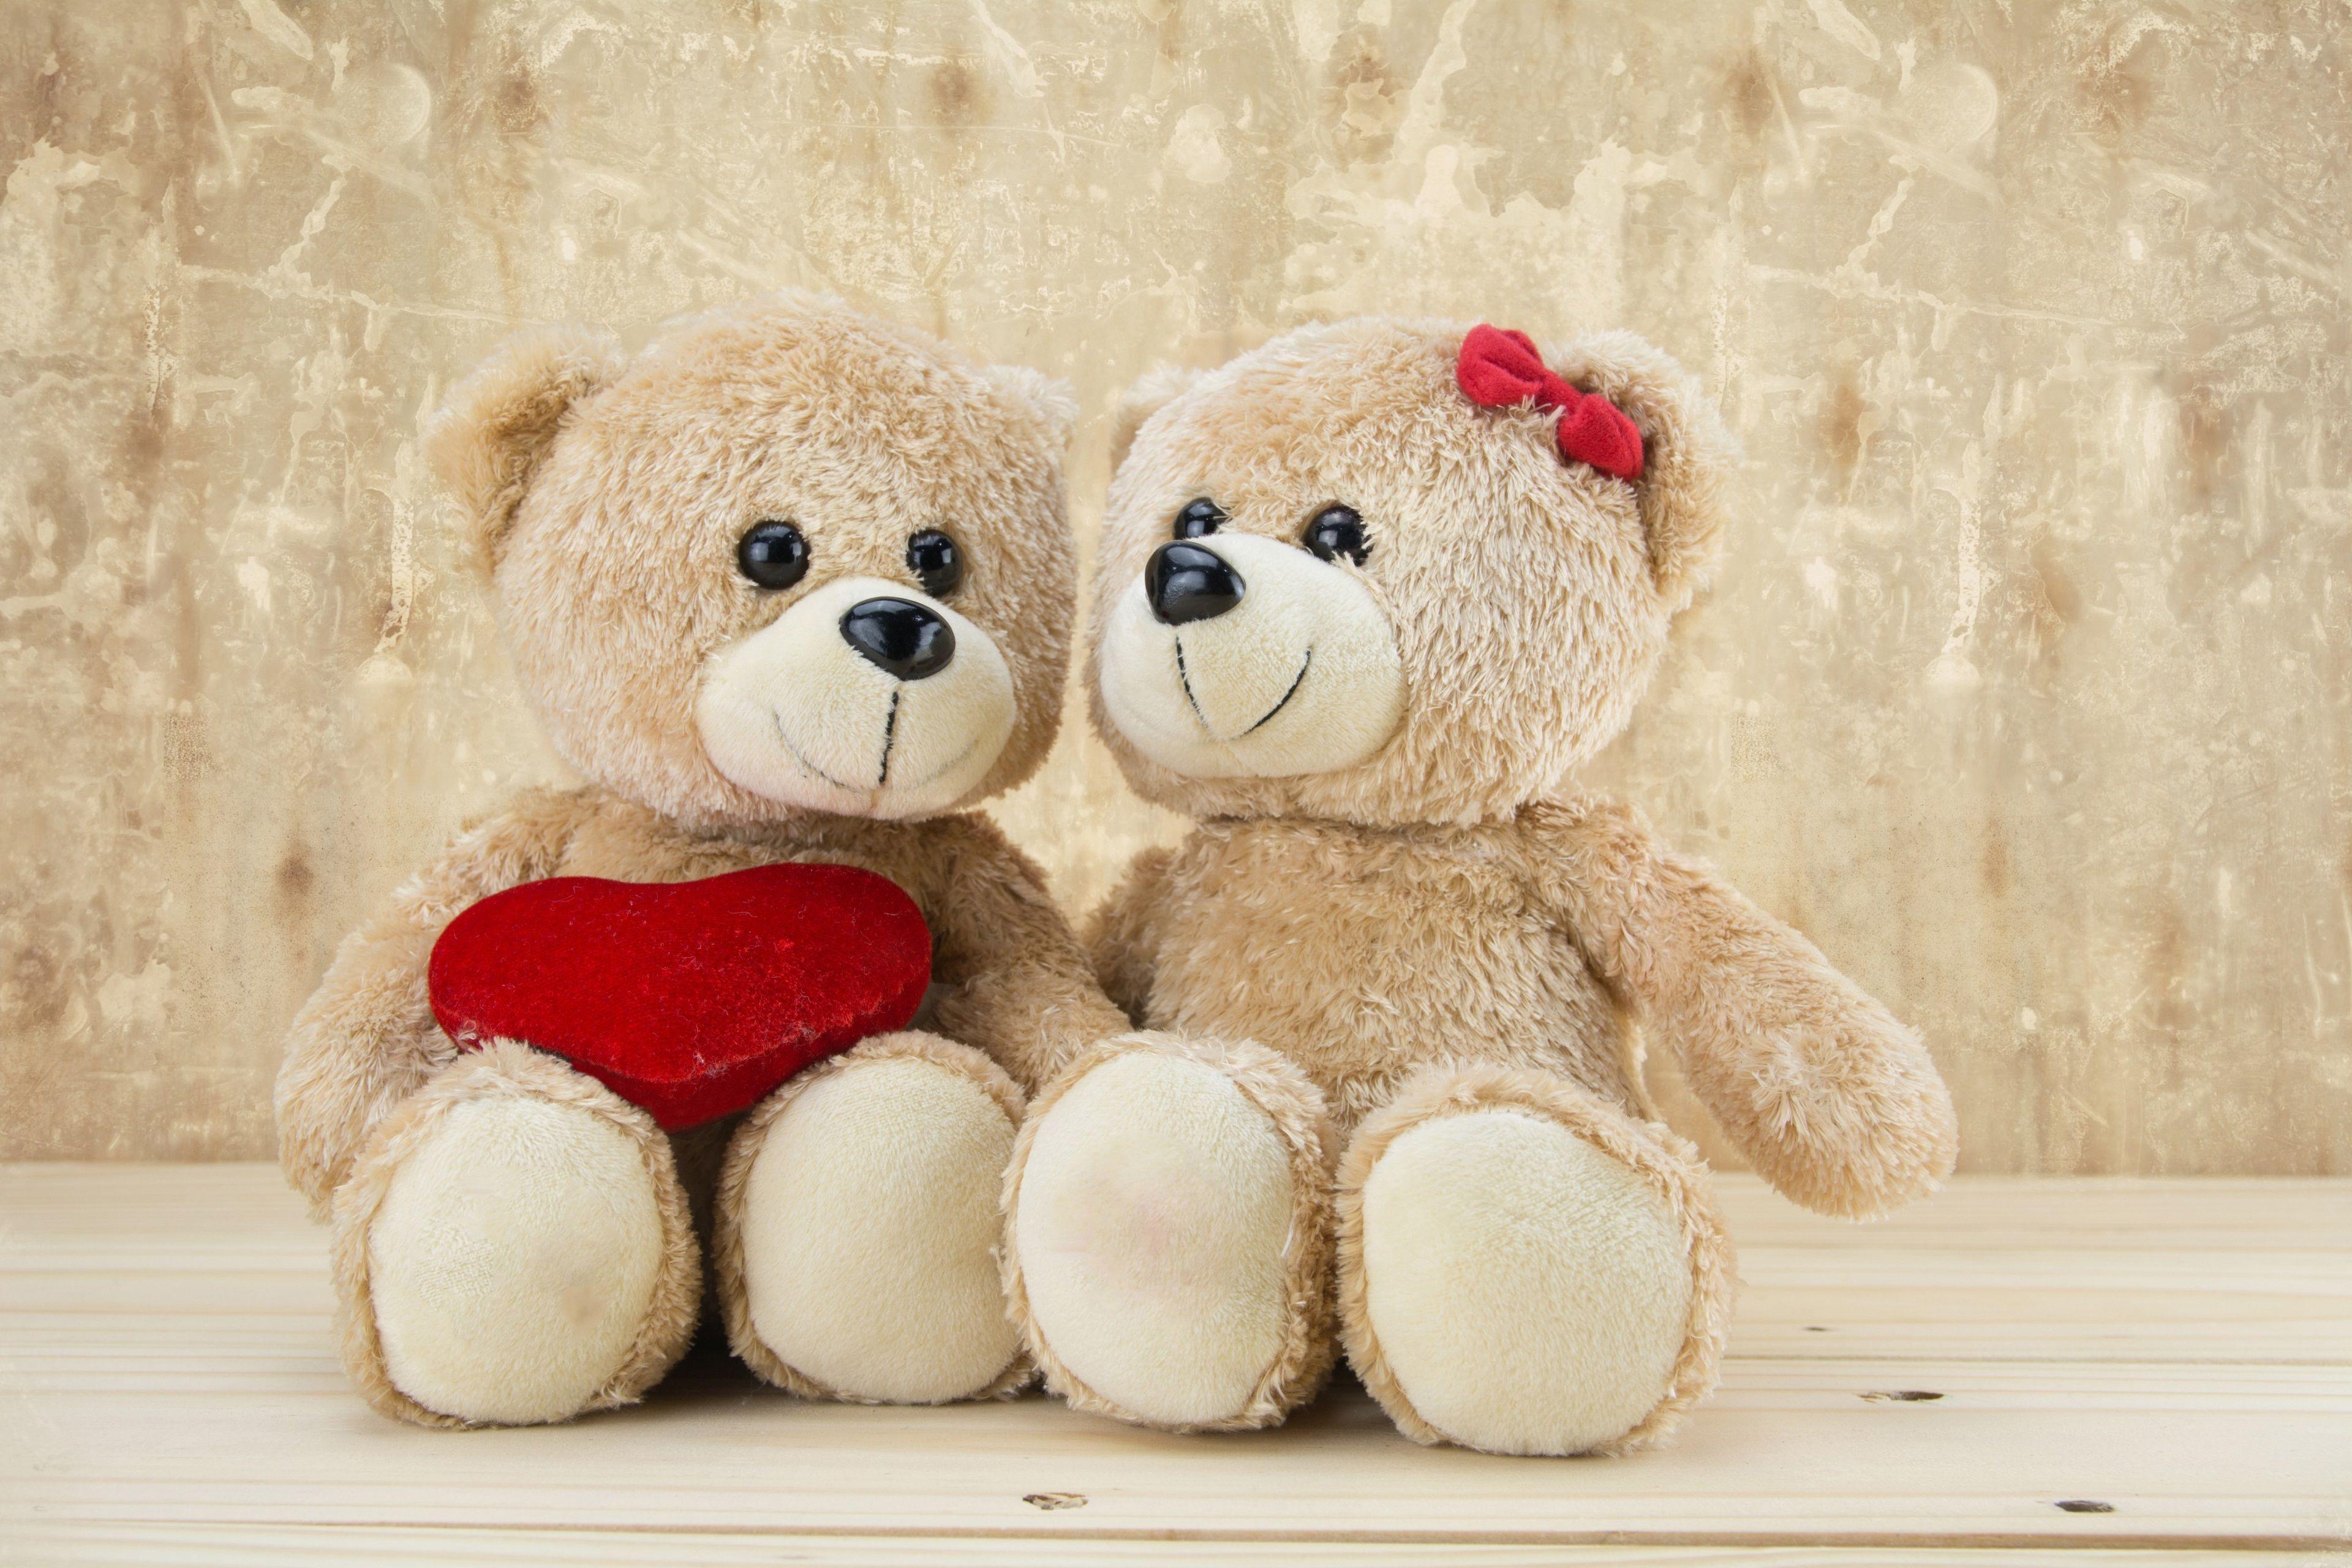 3840x2560 Teddies Couple 4k Full Screen Wallpaper Hd Teddy Bear Wallpaper Teddy Bear Teddy Day